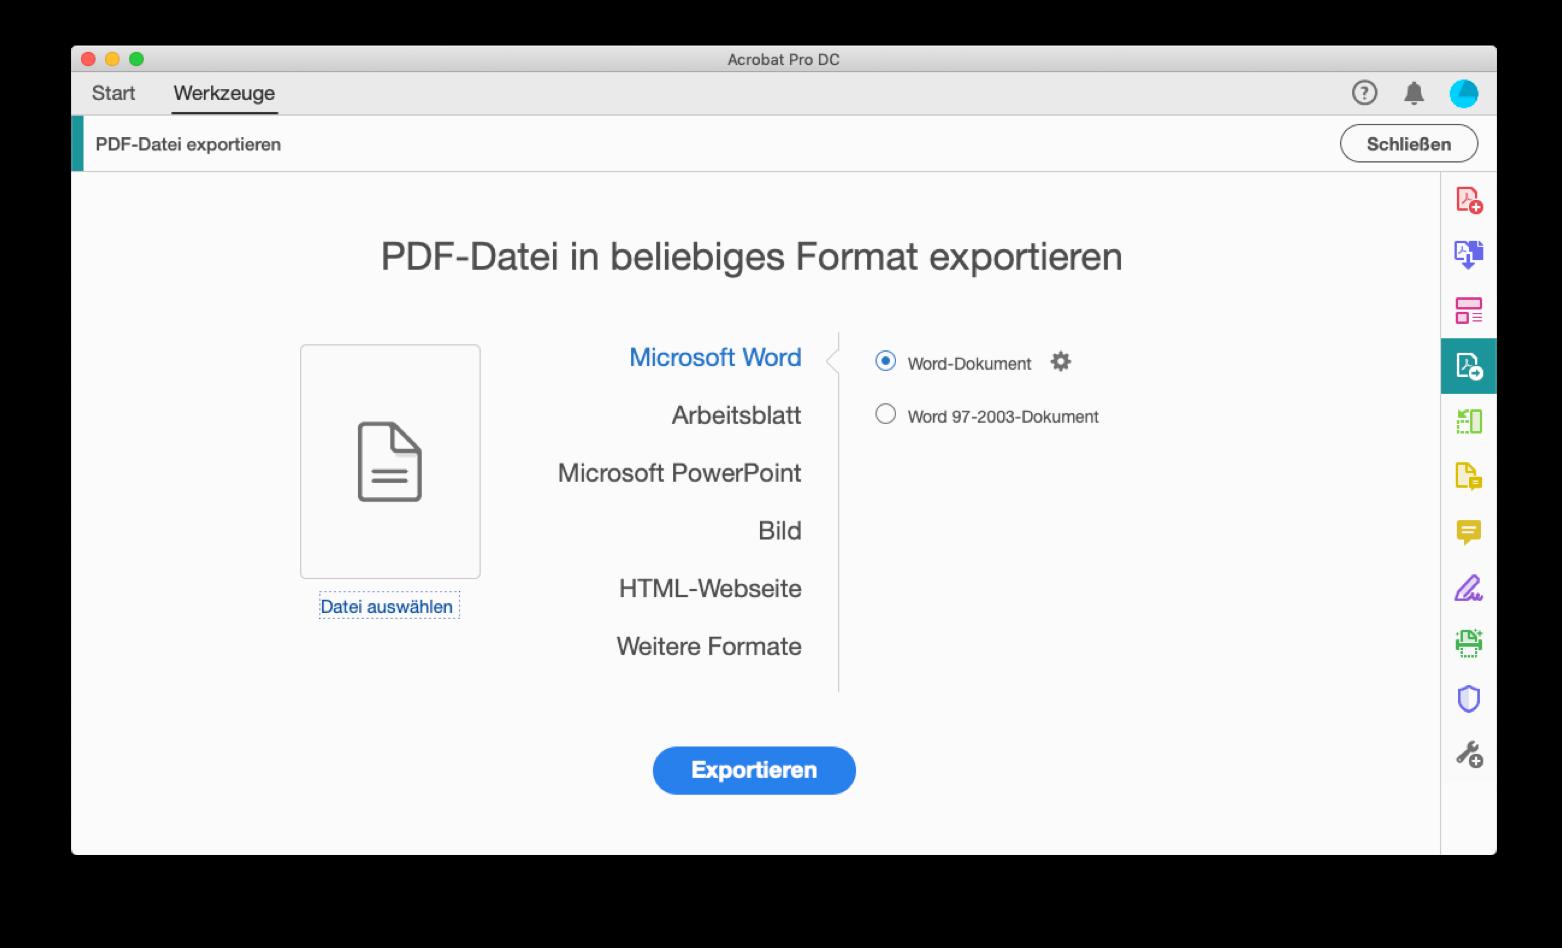 Mit Acrobat Pro PDFs in andere Formate konvertieren